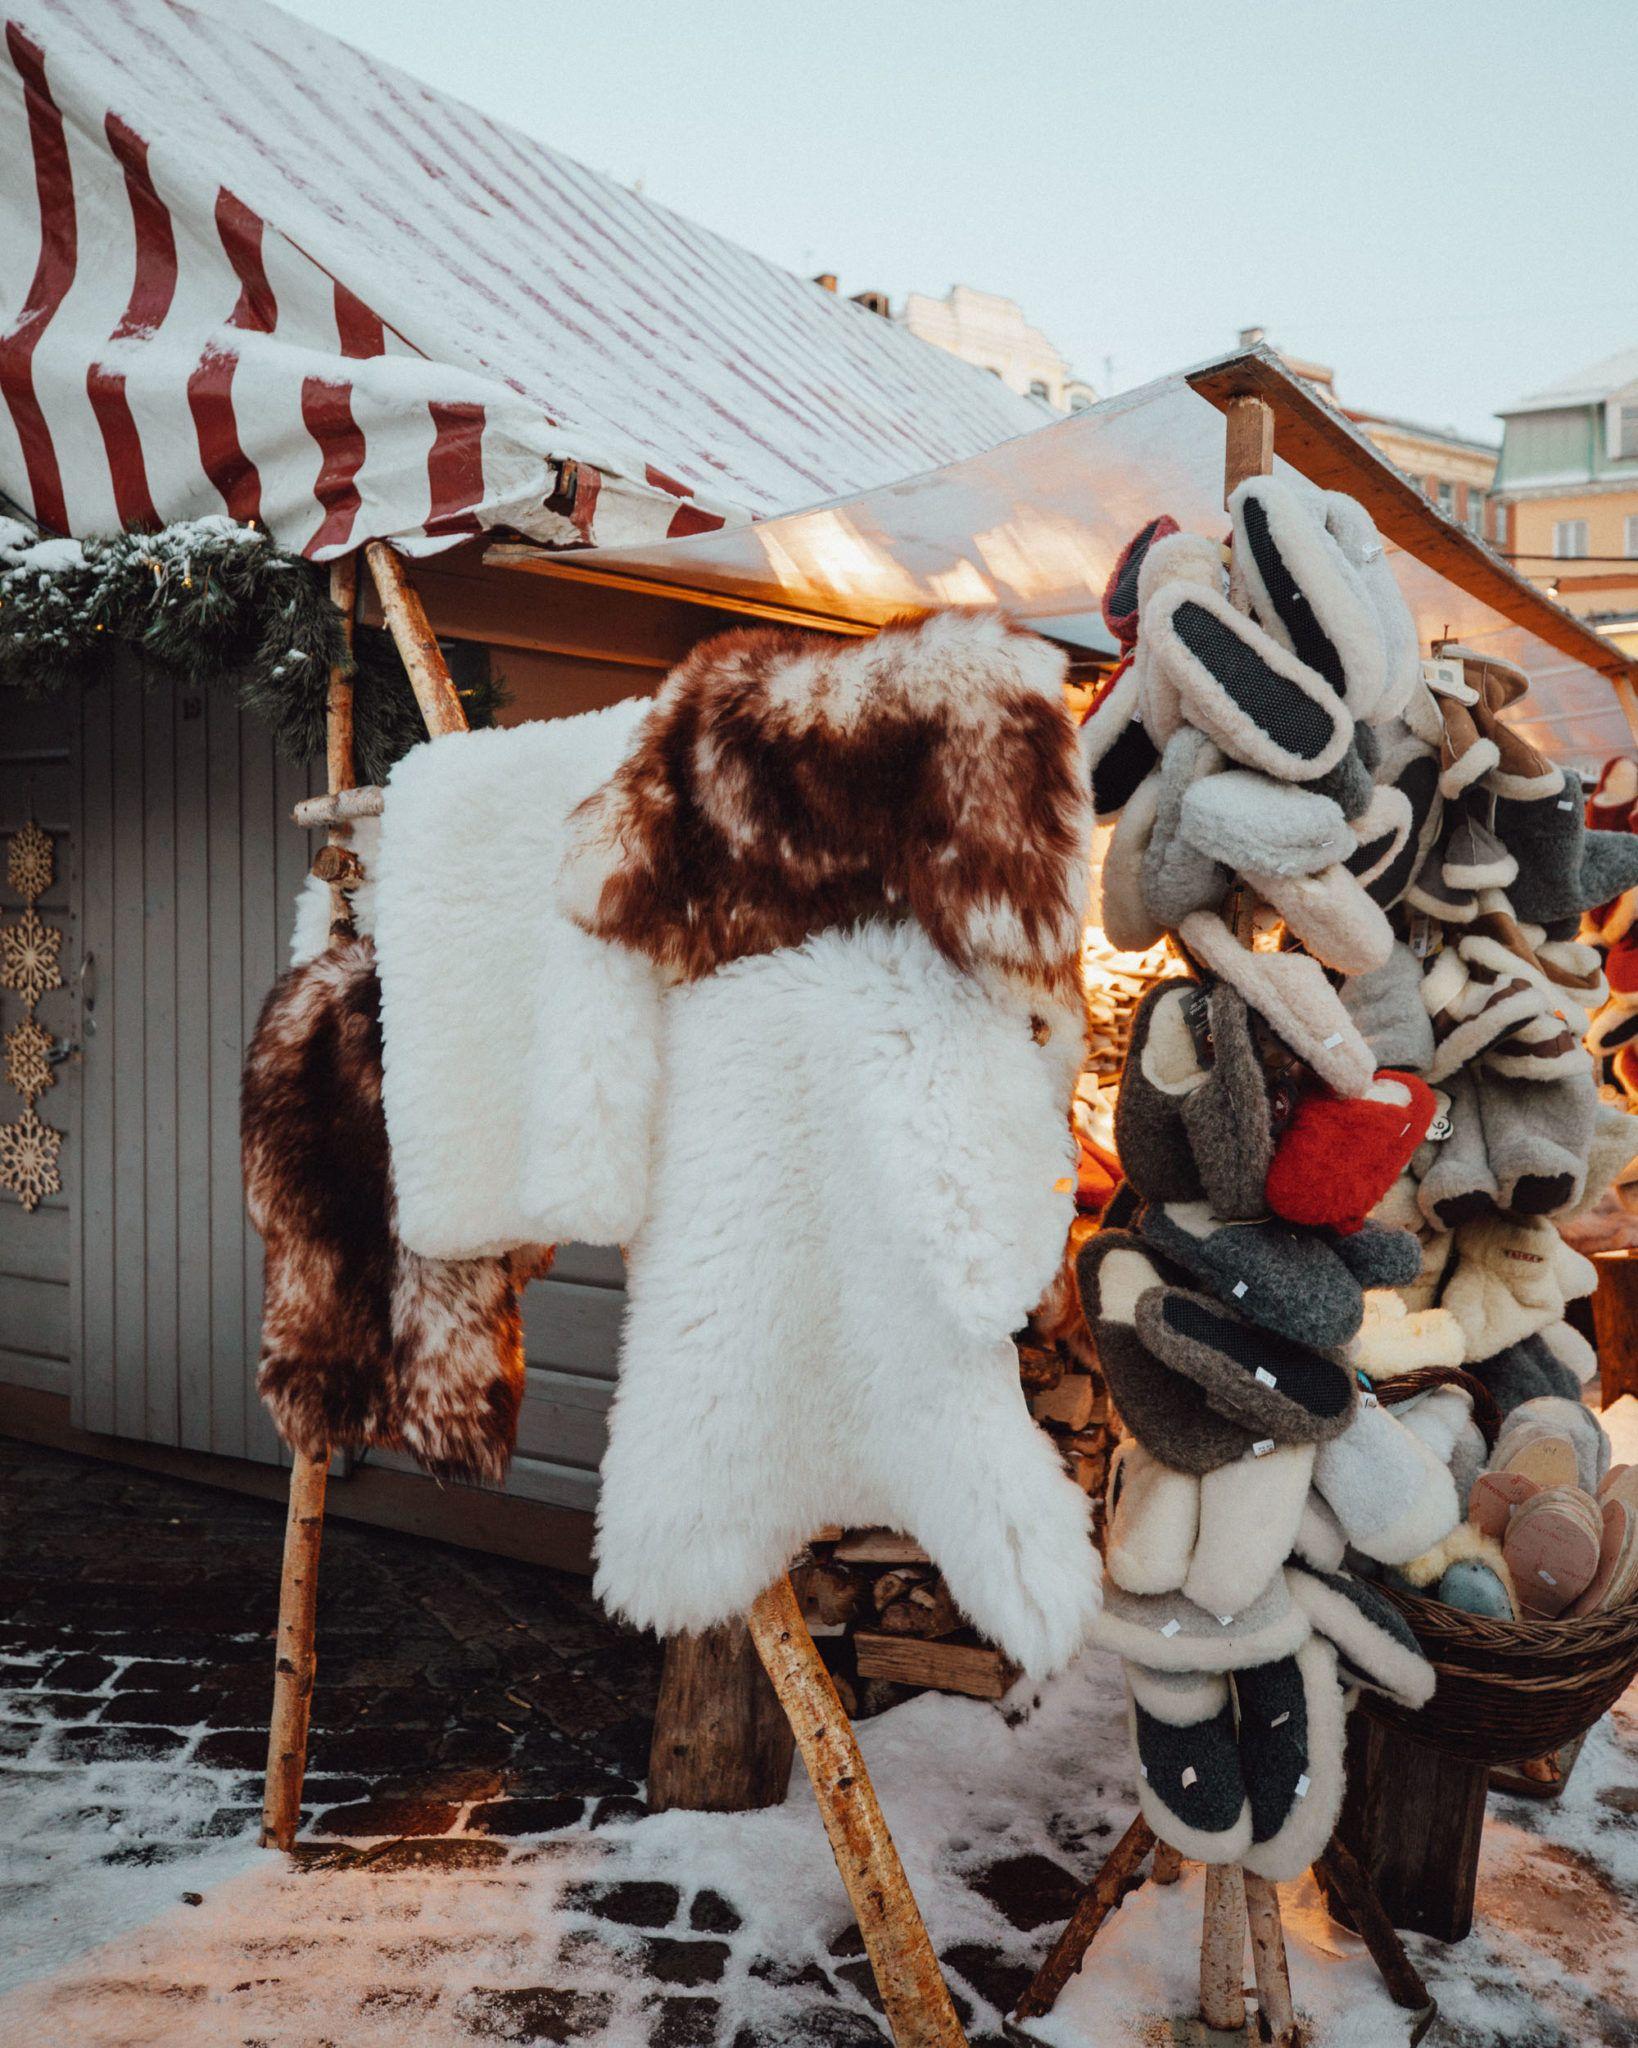 Christmas Market Road Trip Itinerary: Estonia, Latvia, Lithuania